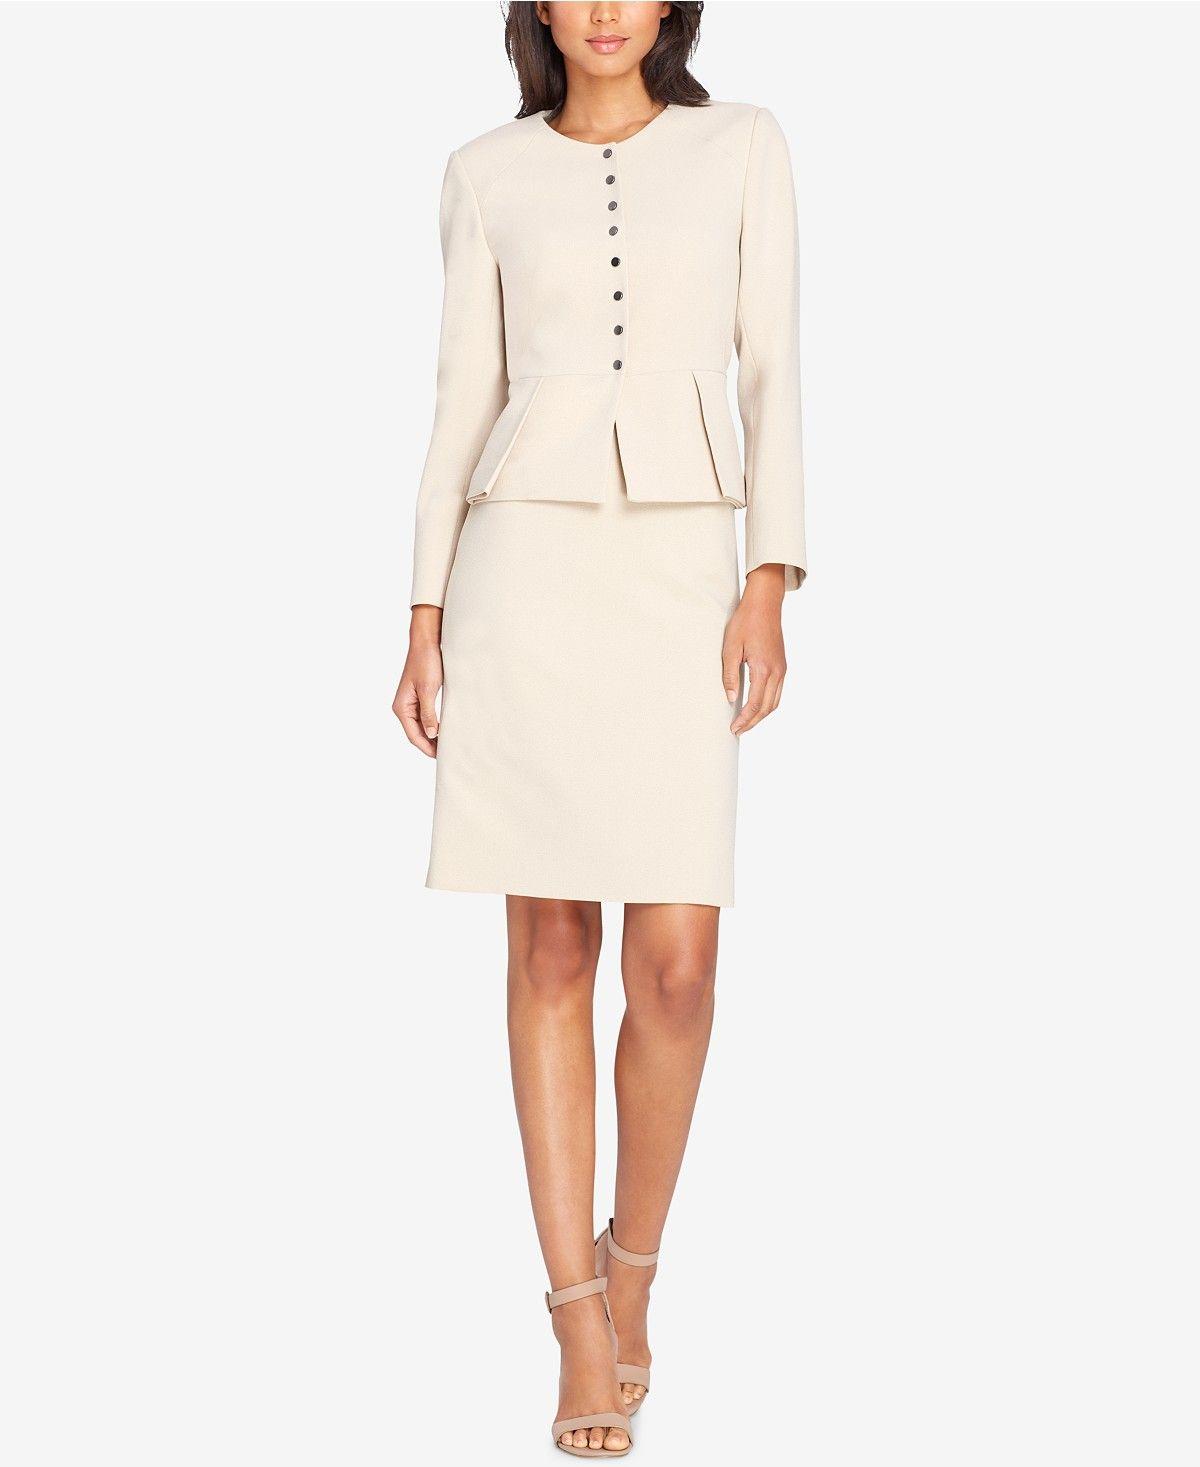 a3bc471b381 Tahari ASL Pleated Peplum Skirt Suit - Wear to Work - Women - Macy s ...